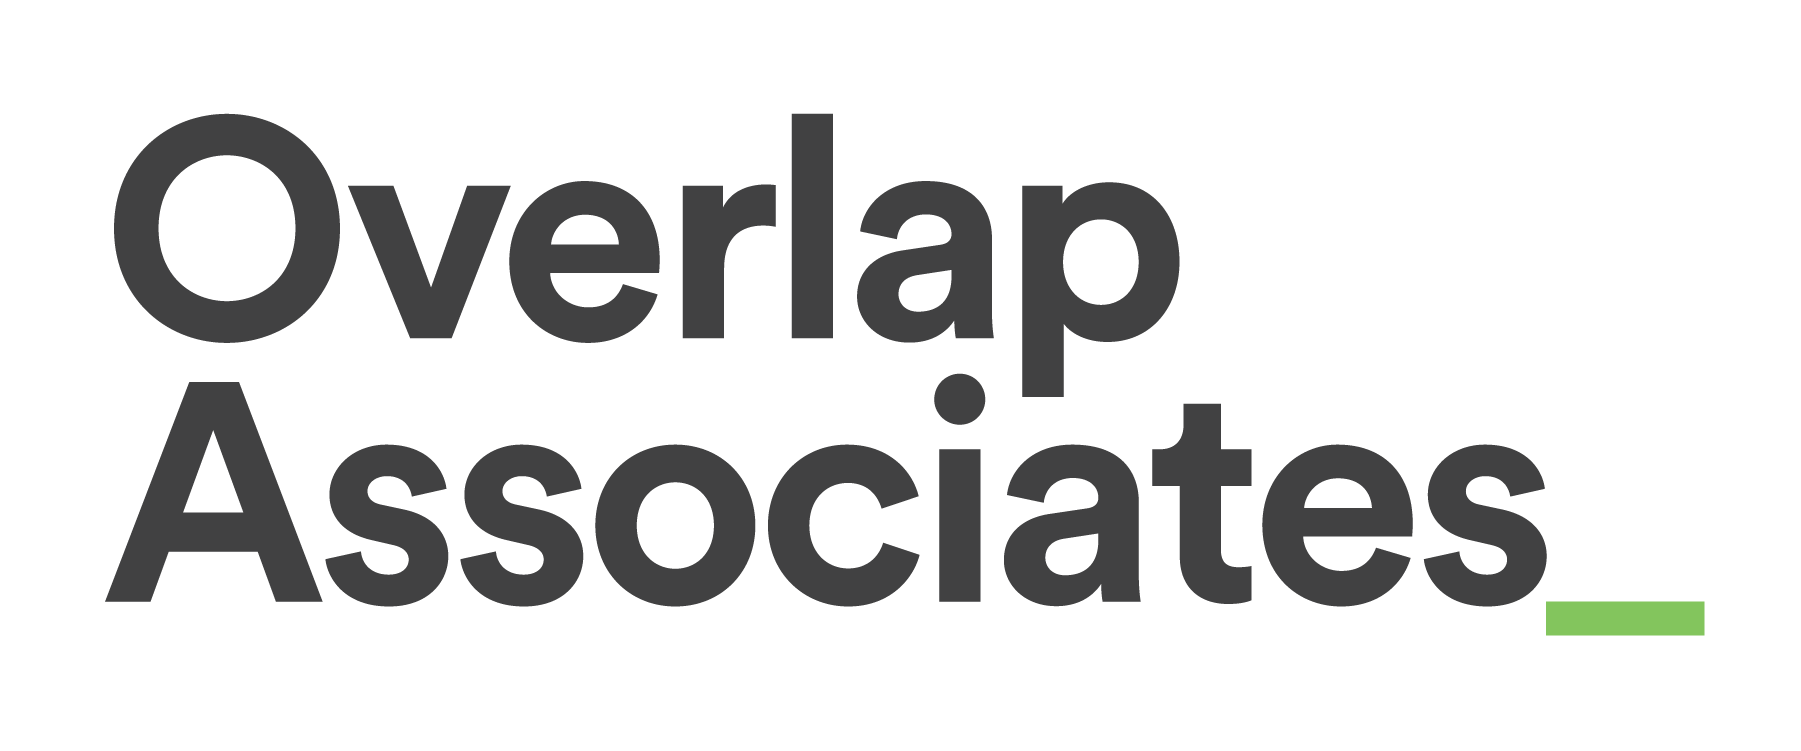 Overlap Associates